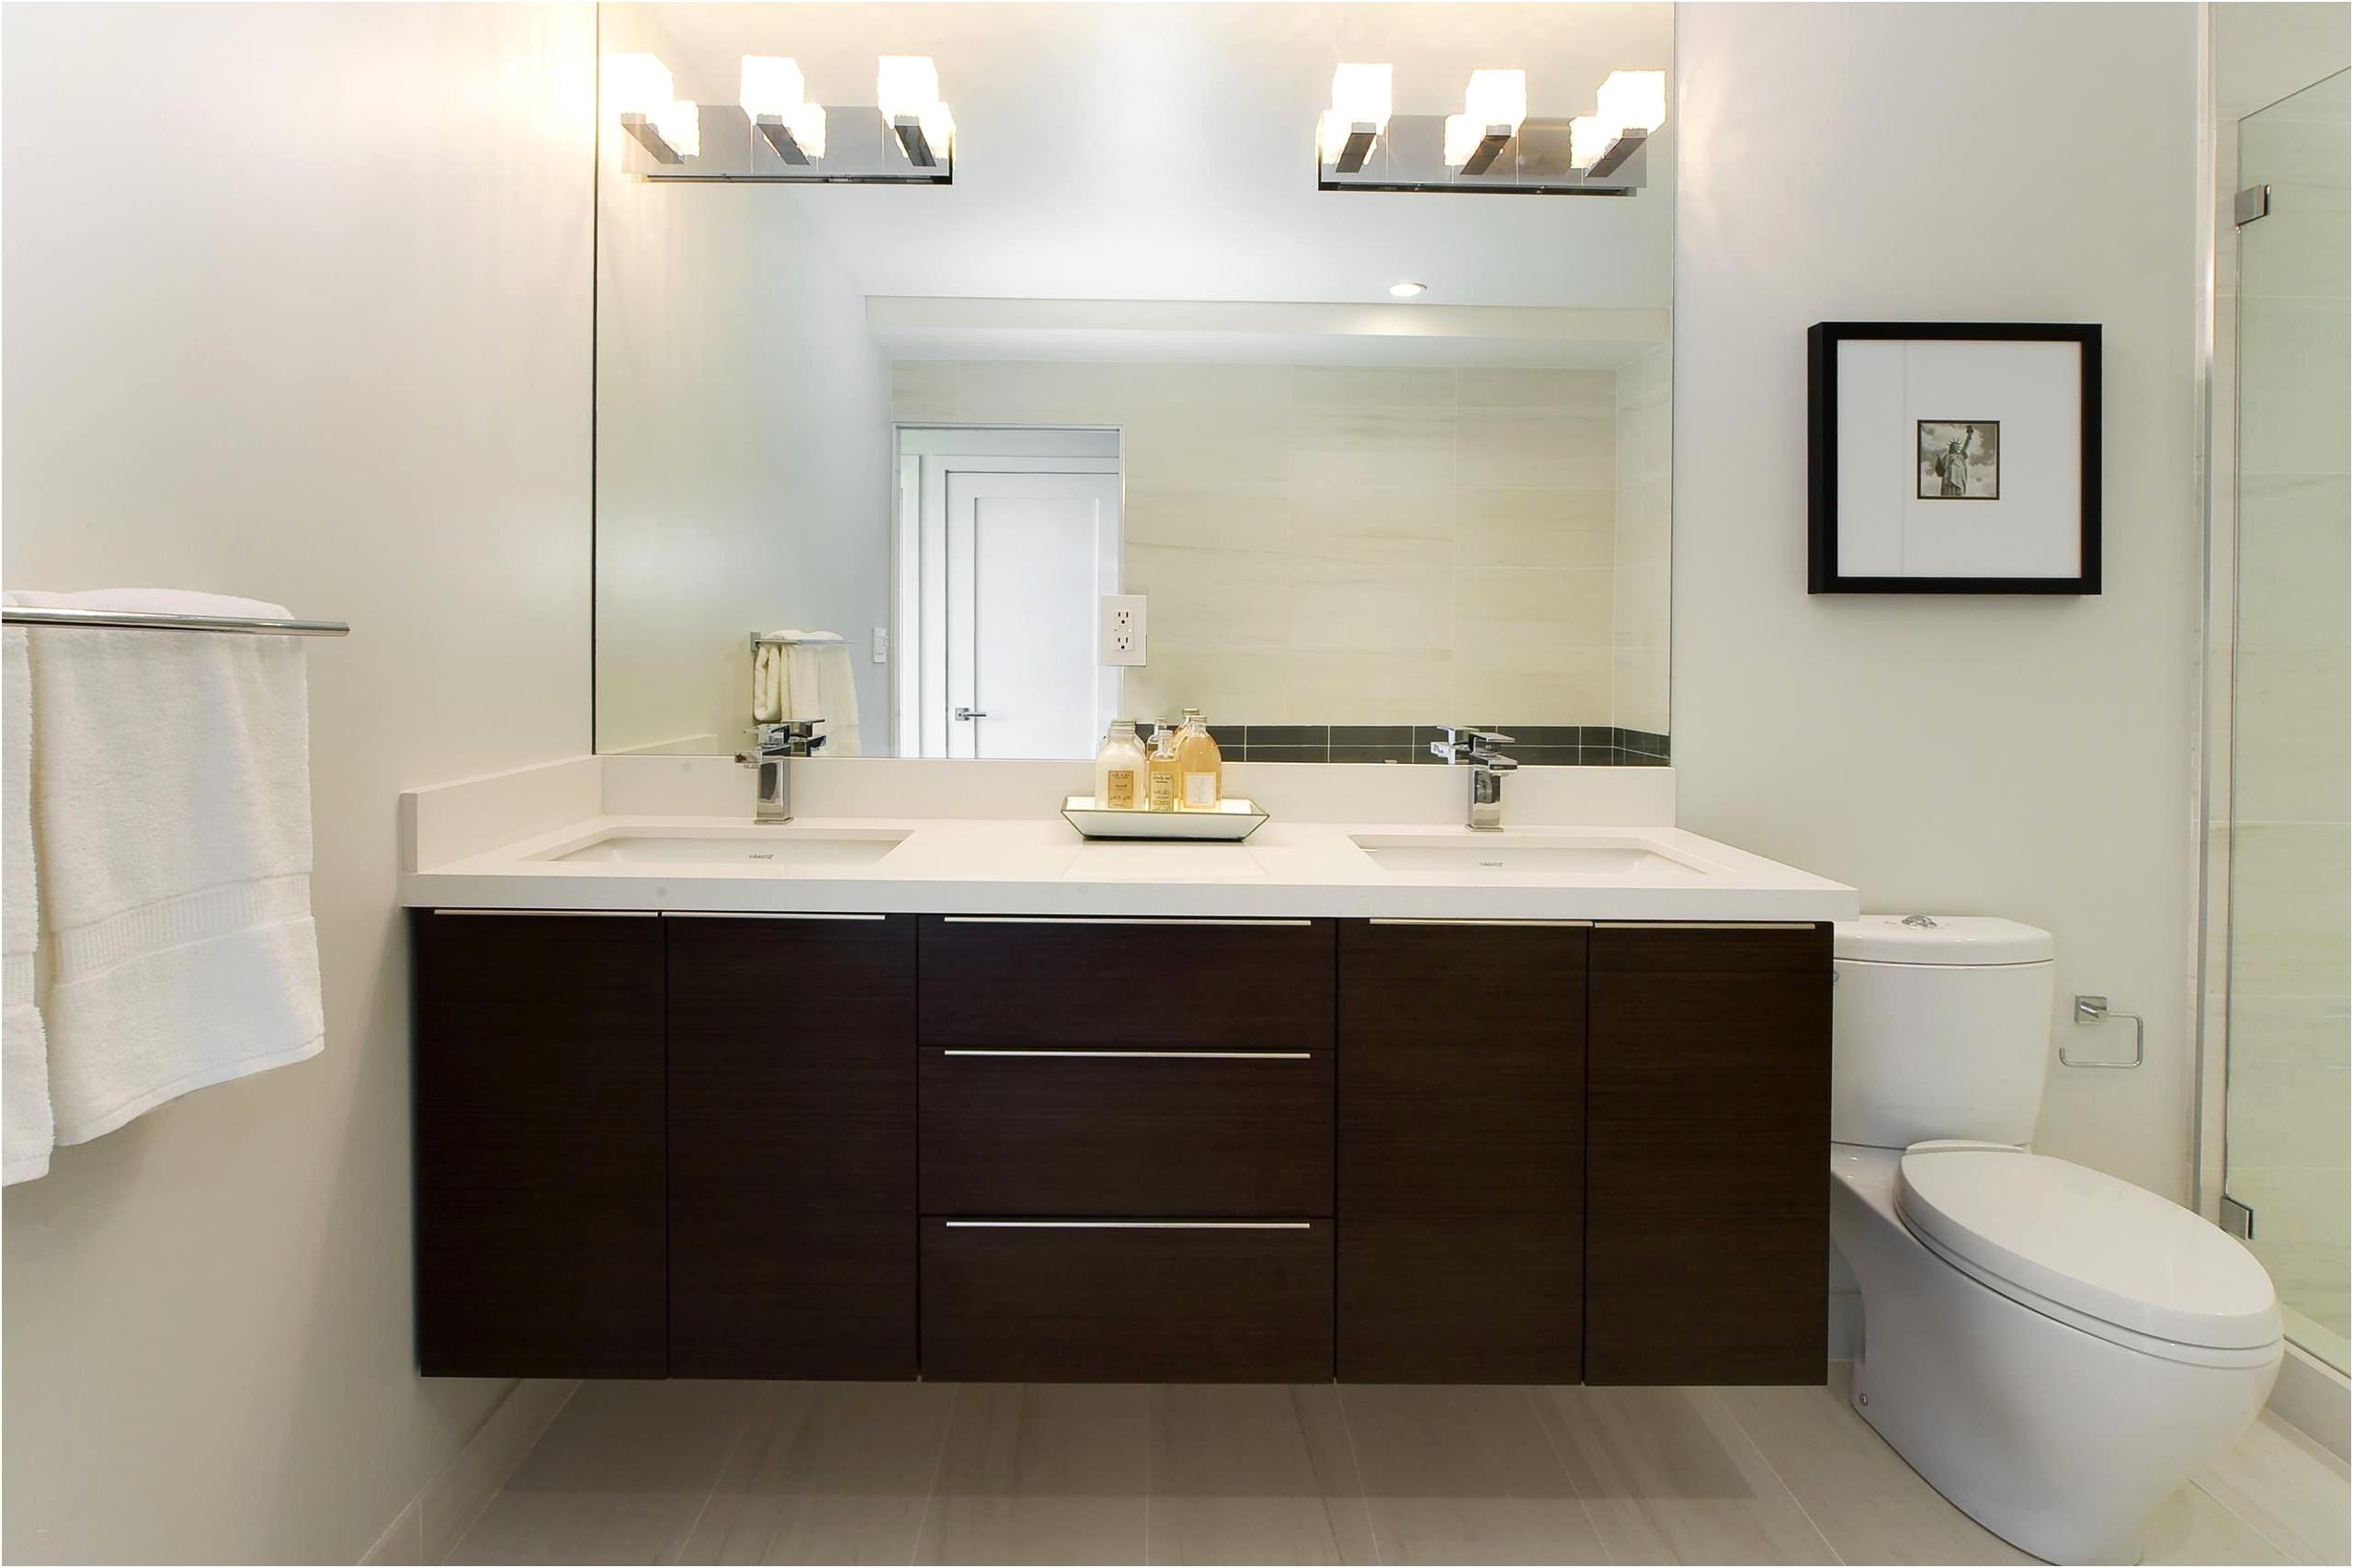 bathroom sinks sale lovely h sink new bathroom i 0d inspiring installing install of bathroom sinks